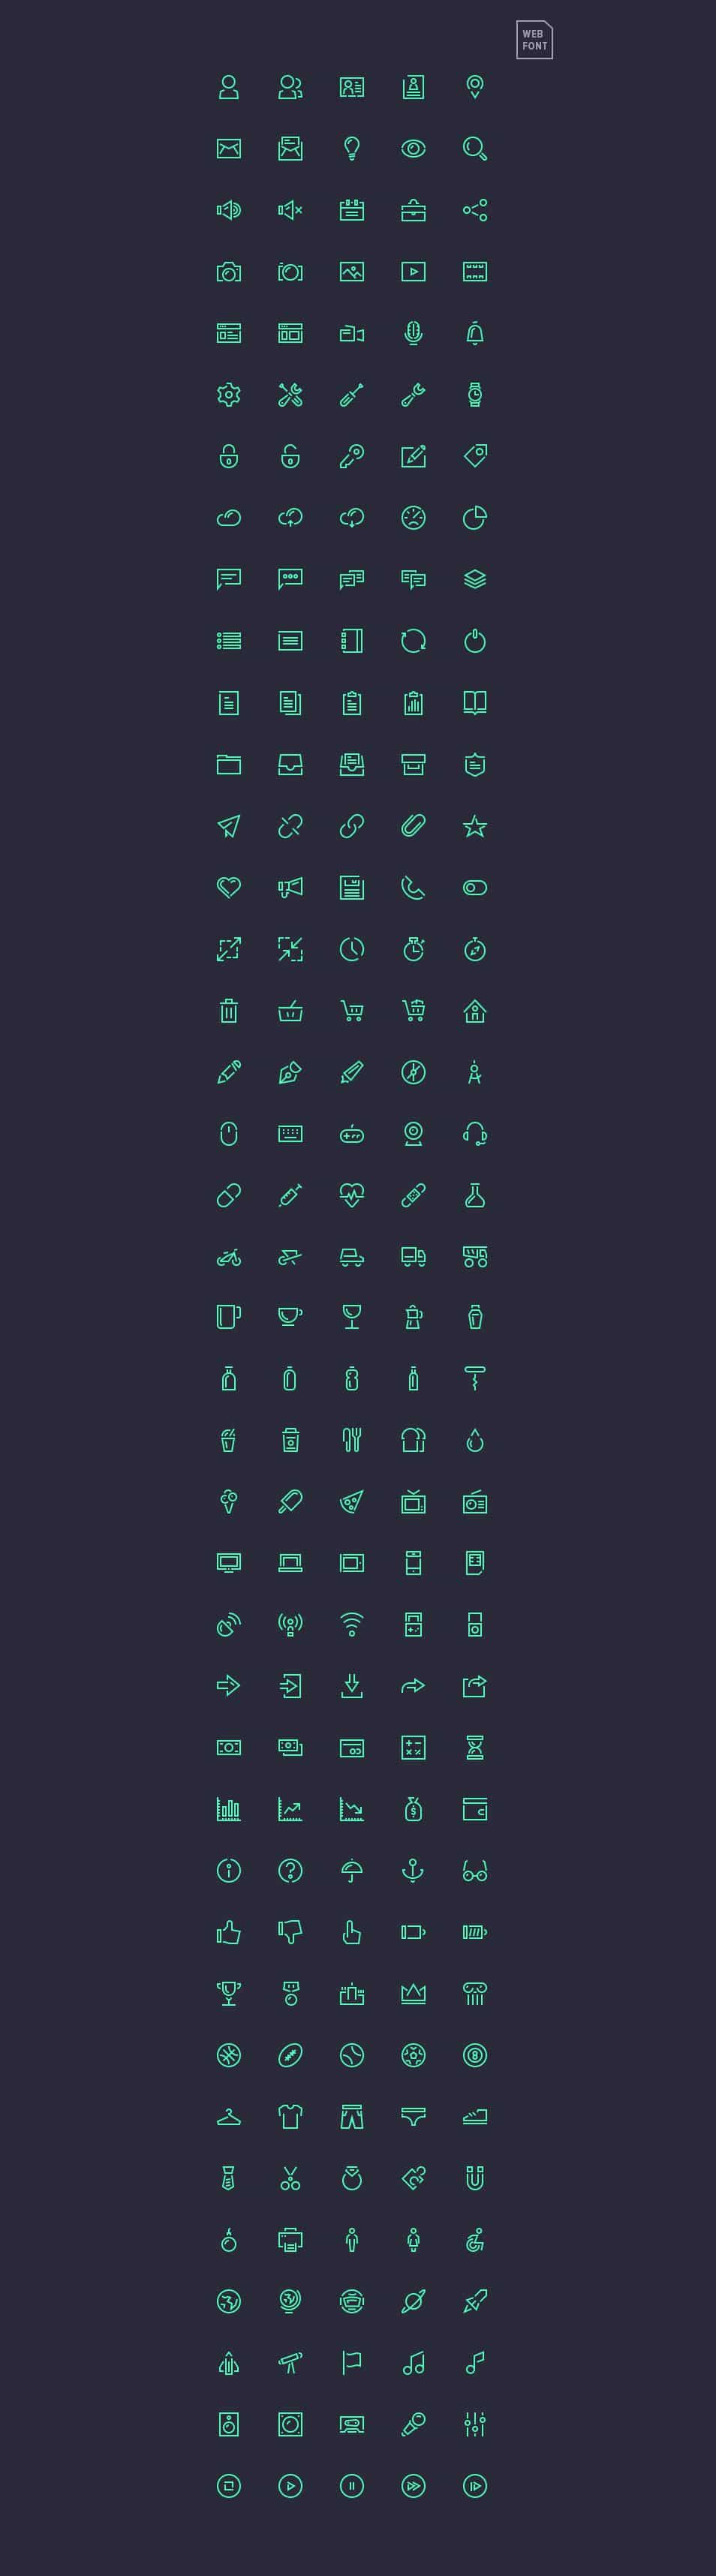 Stroke Gap Icons – Webfont